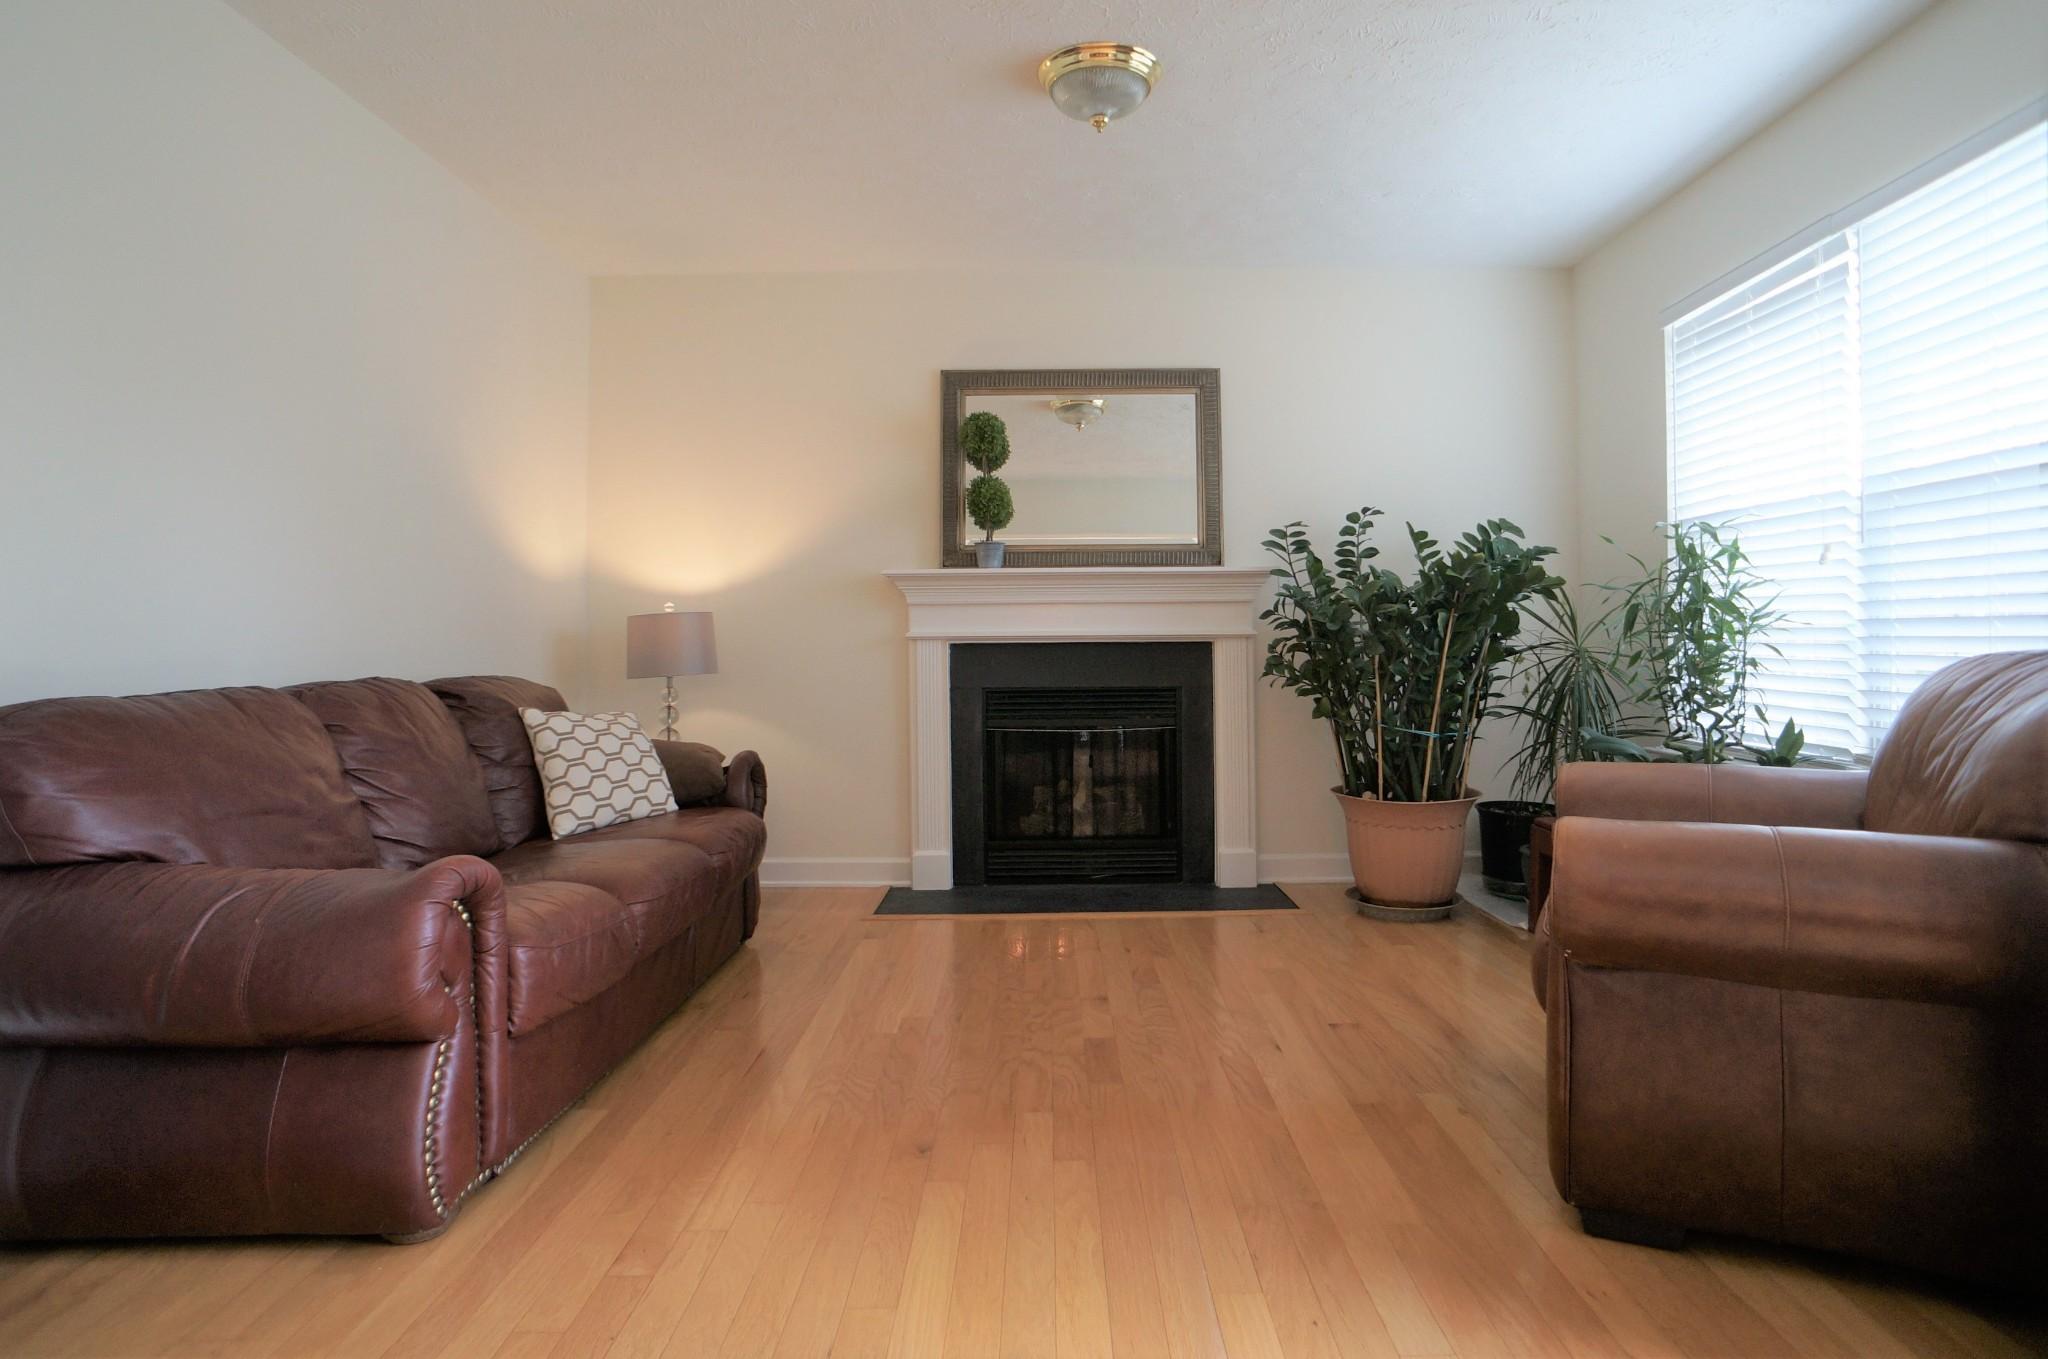 4017 Barnes Cove Dr, Antioch, TN 37013 - Antioch, TN real estate listing